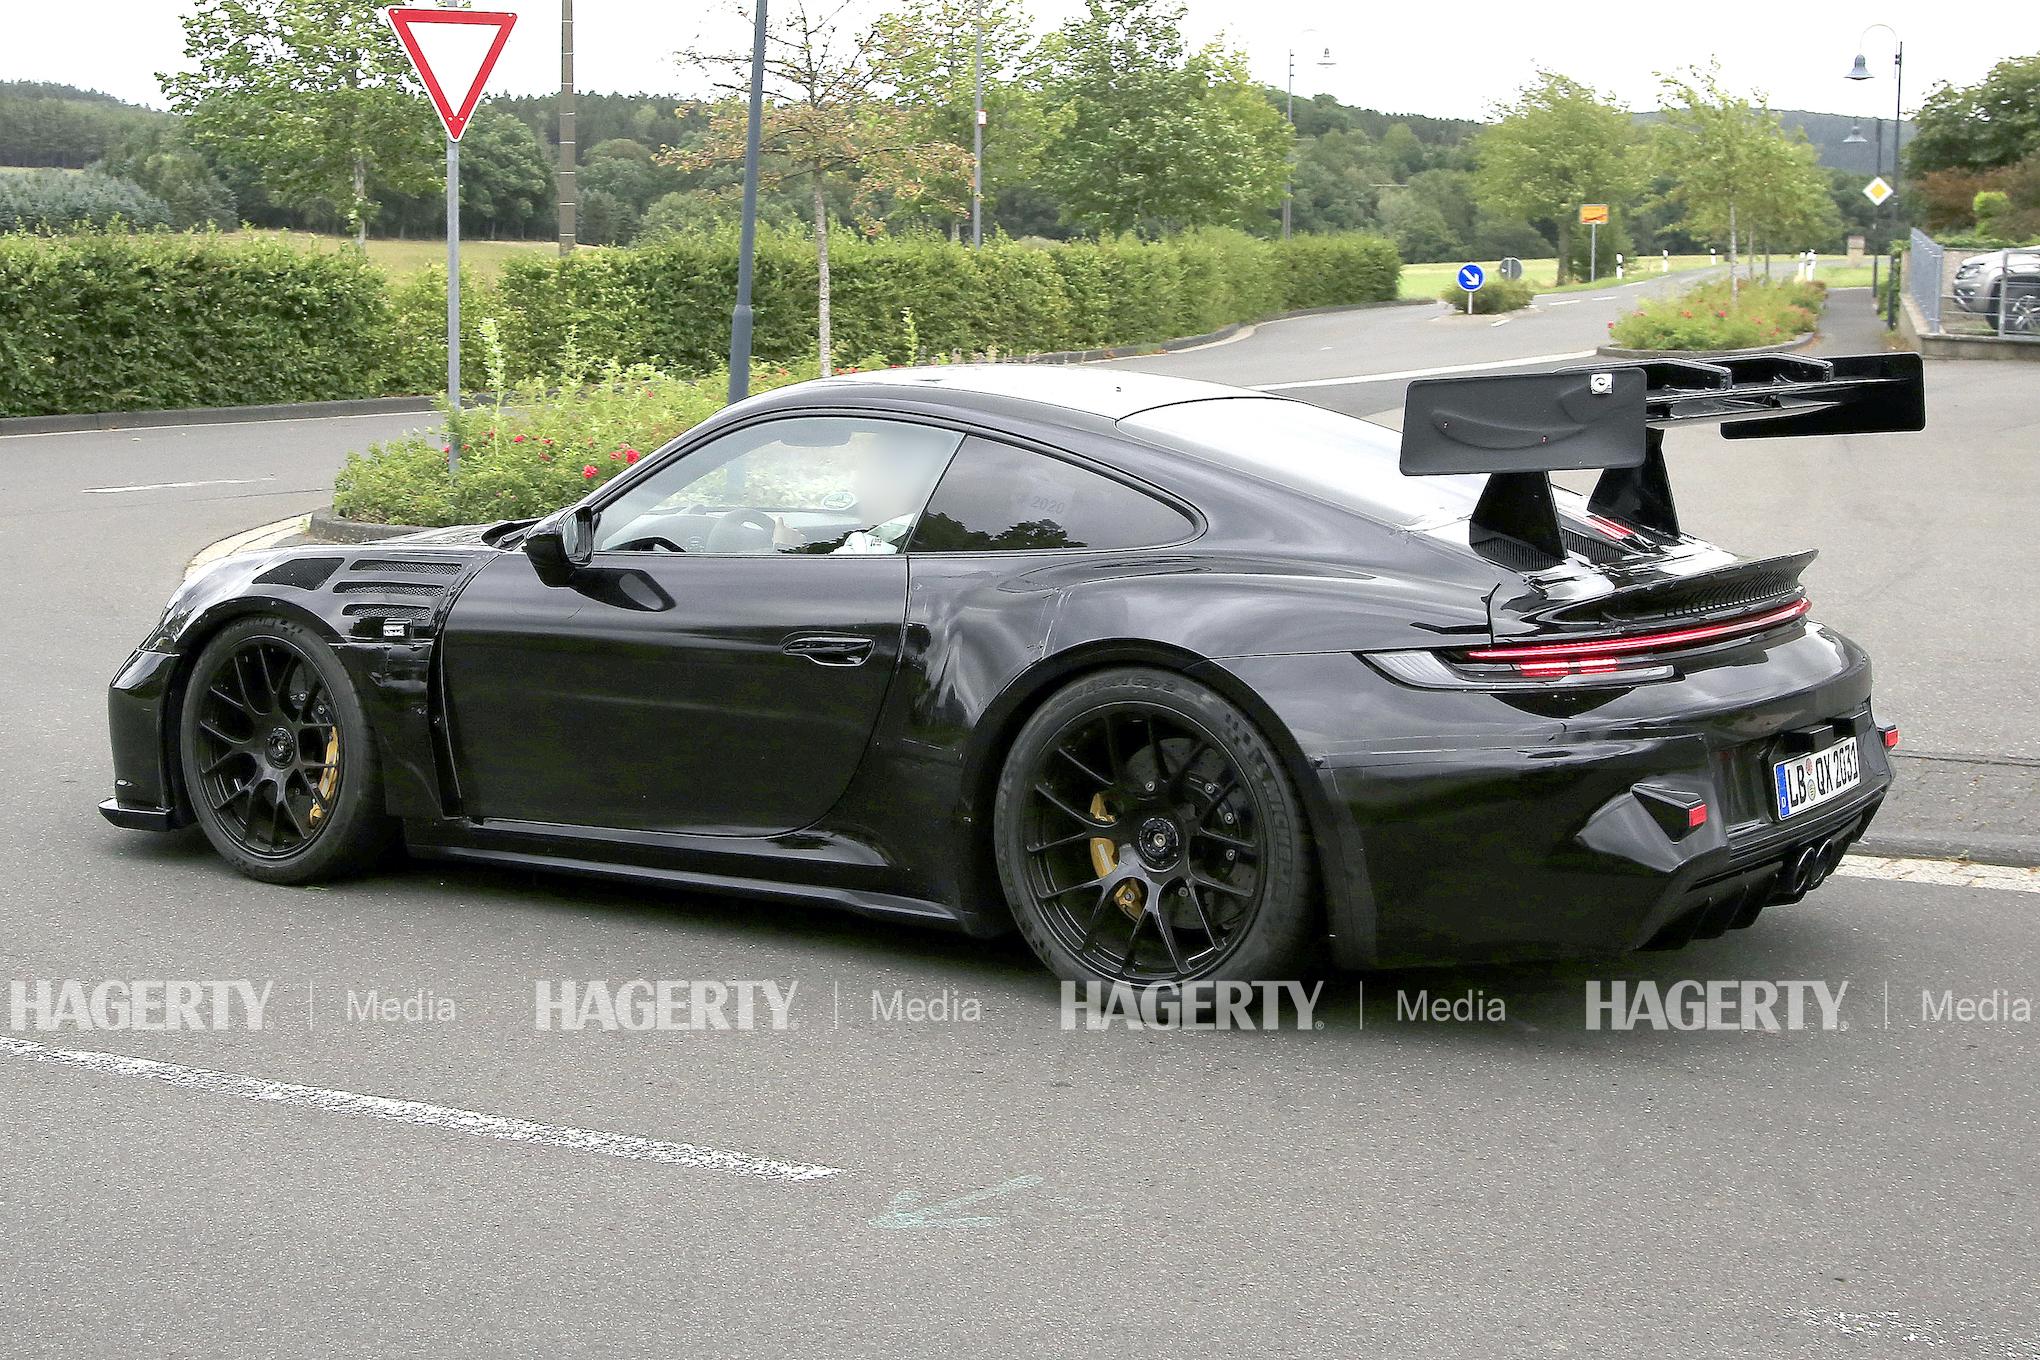 Porsche 911 GT3 RS rear three-quarter test drive action